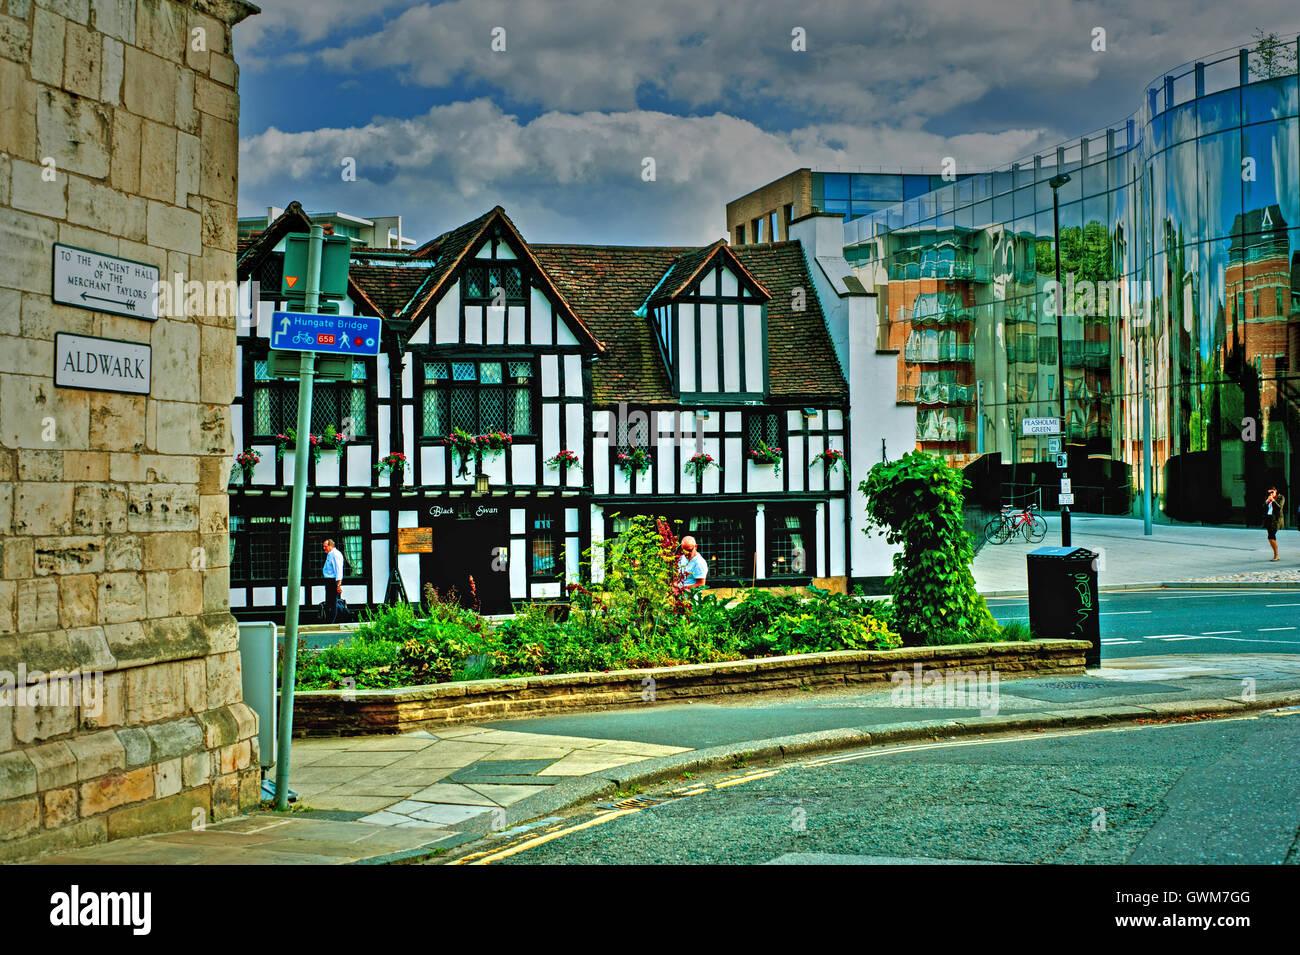 Aldwark and Peasholme Green, York - Stock Image